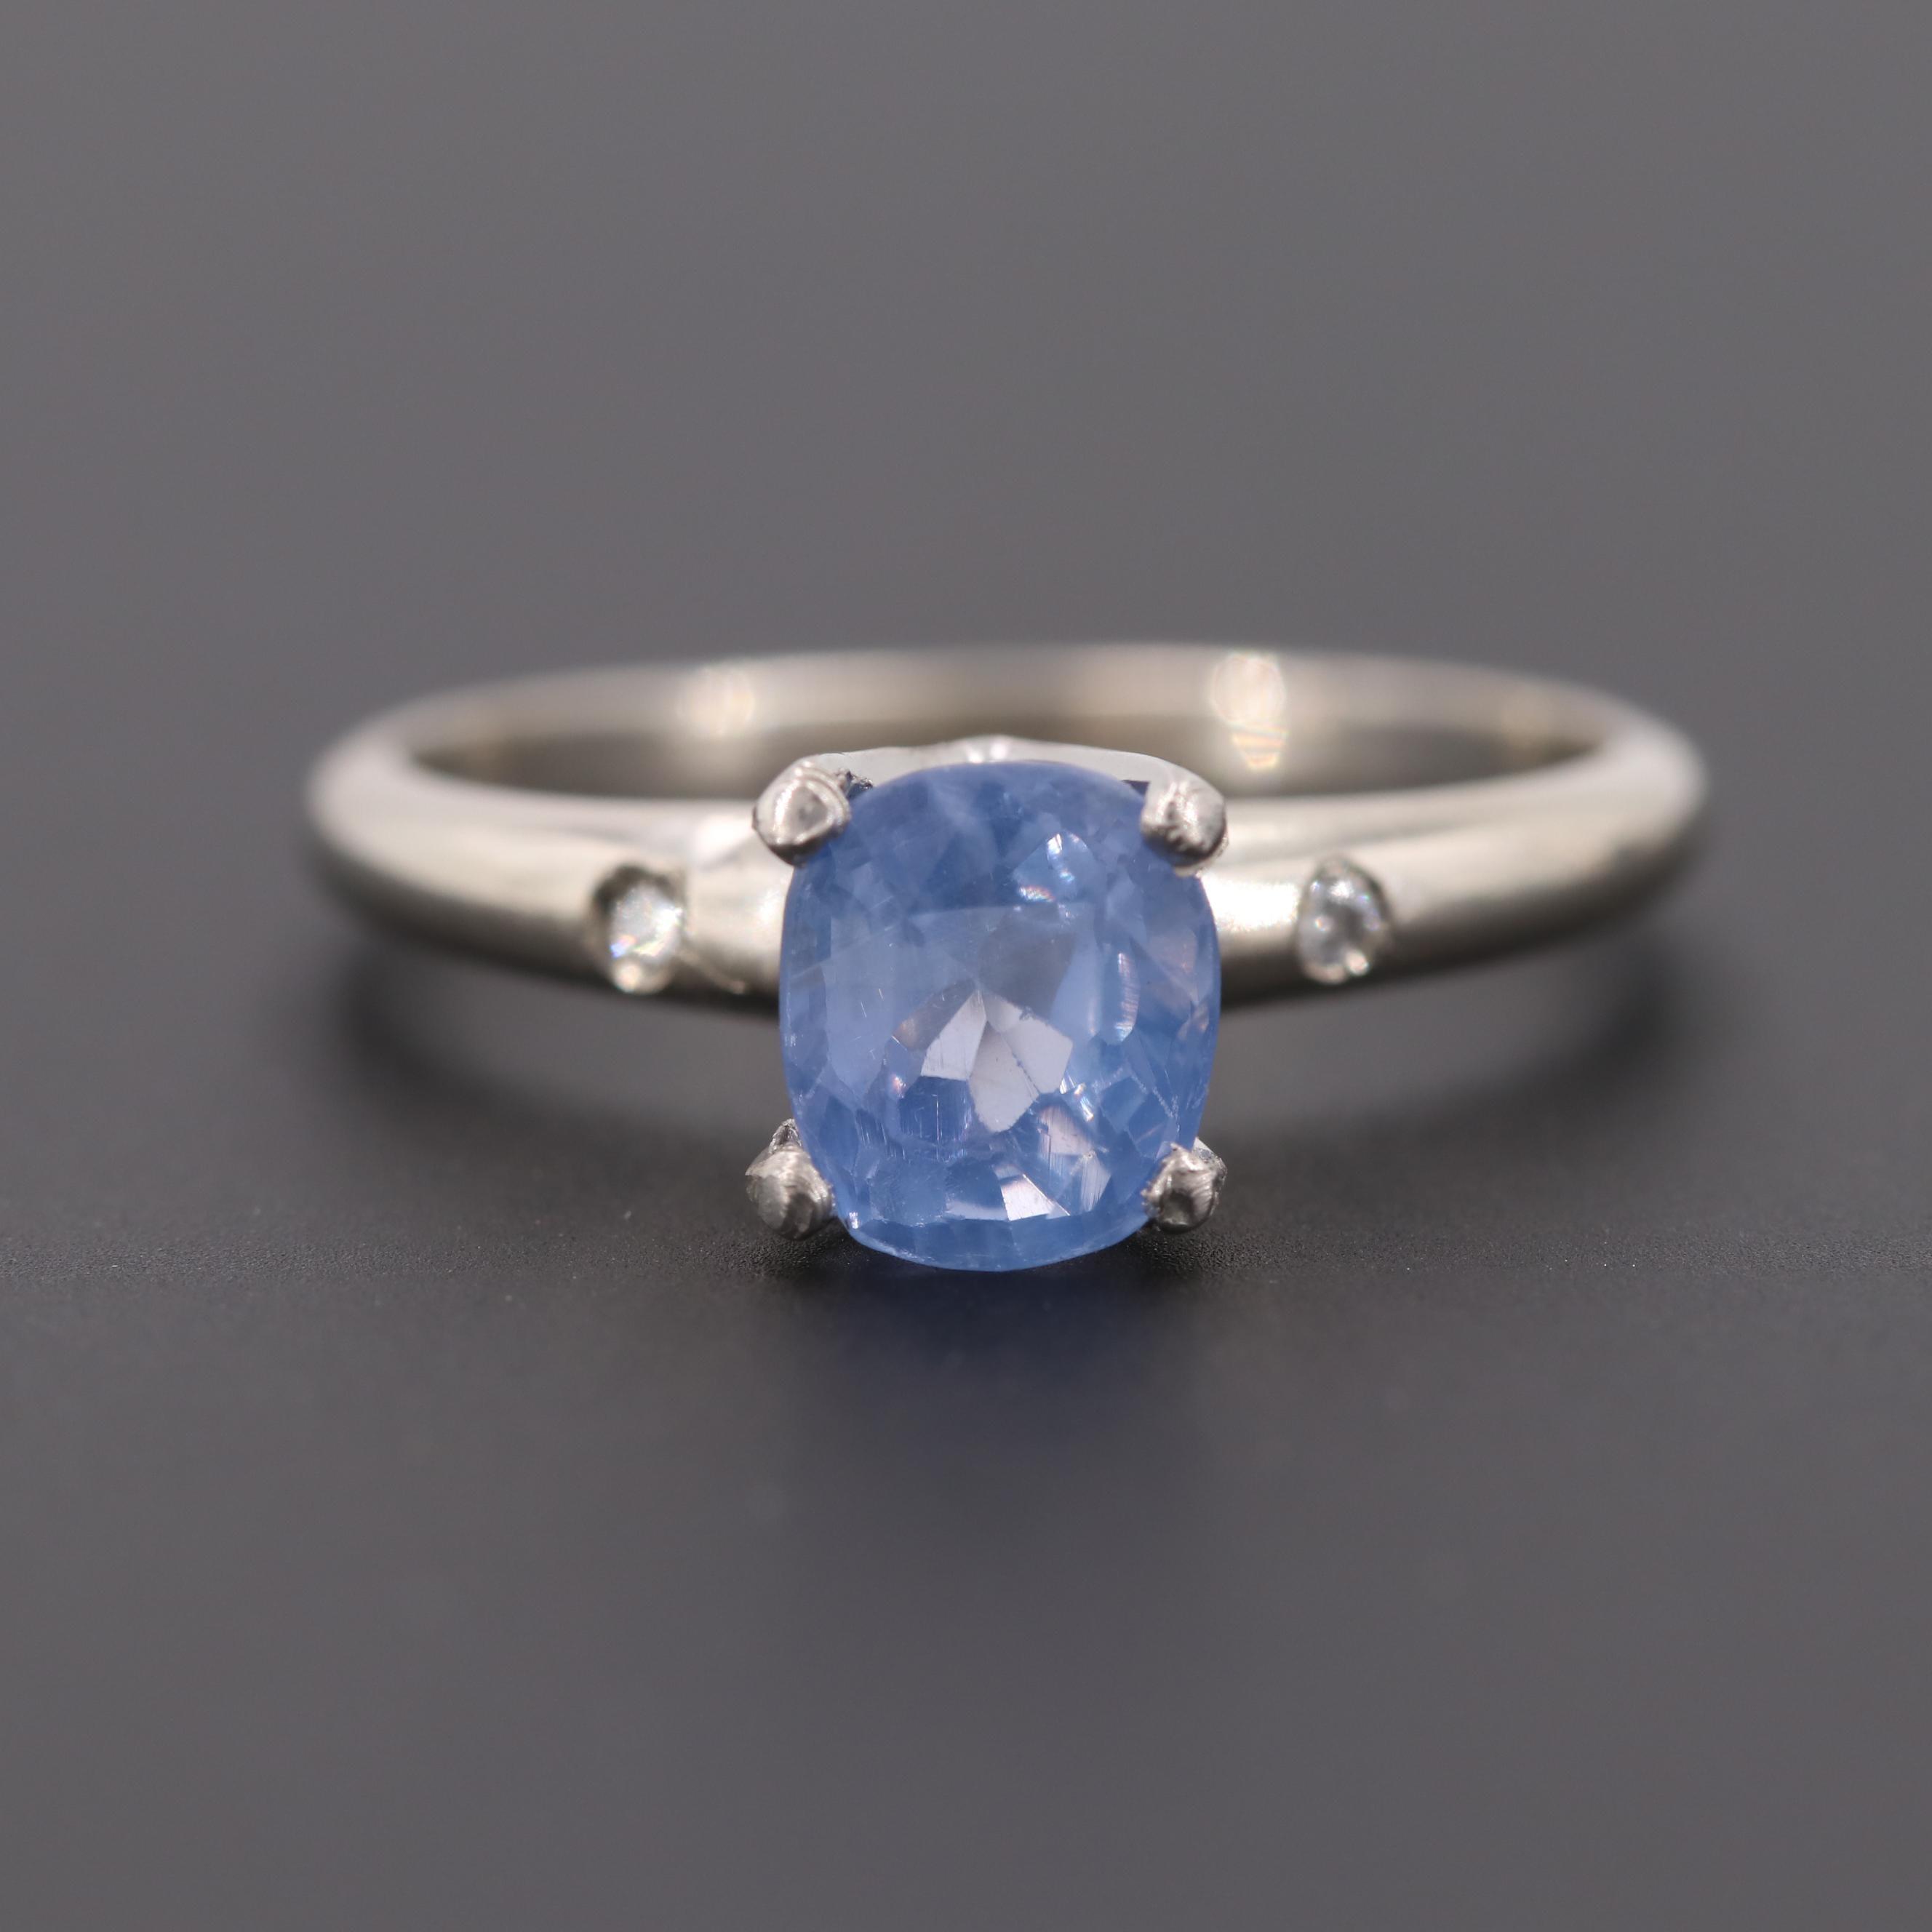 14K White Gold 1.37 CT Sapphire and Diamond Ring with Palladium Head